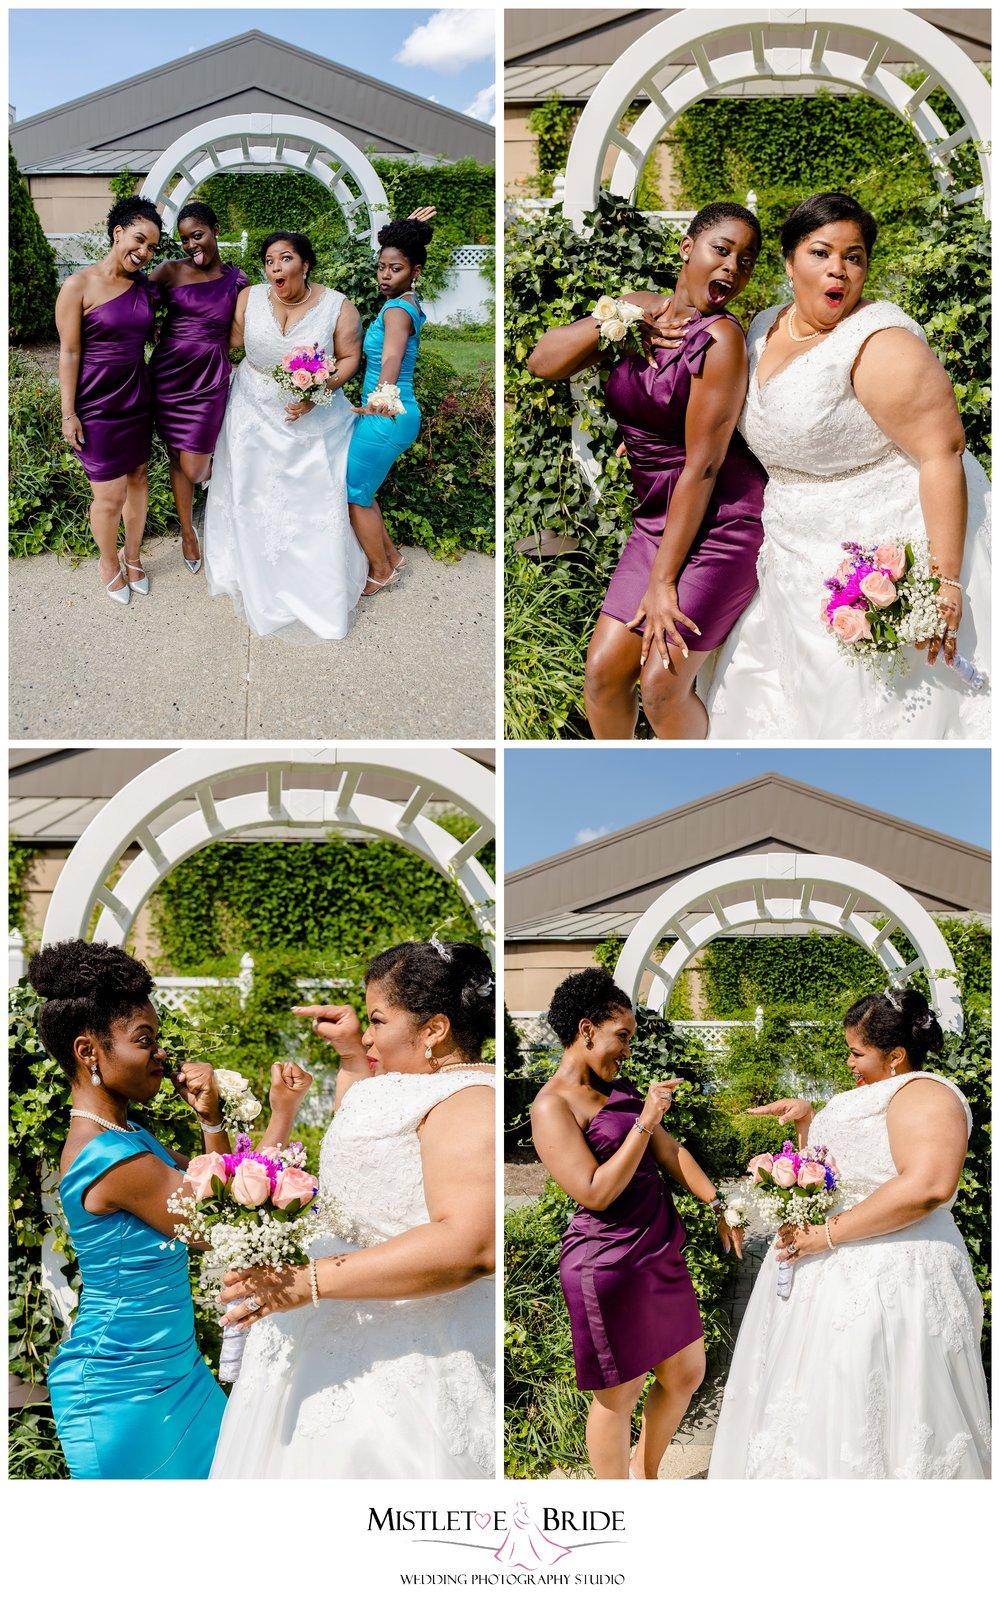 nj-wedding-fairfield-nj-19-194.JPG